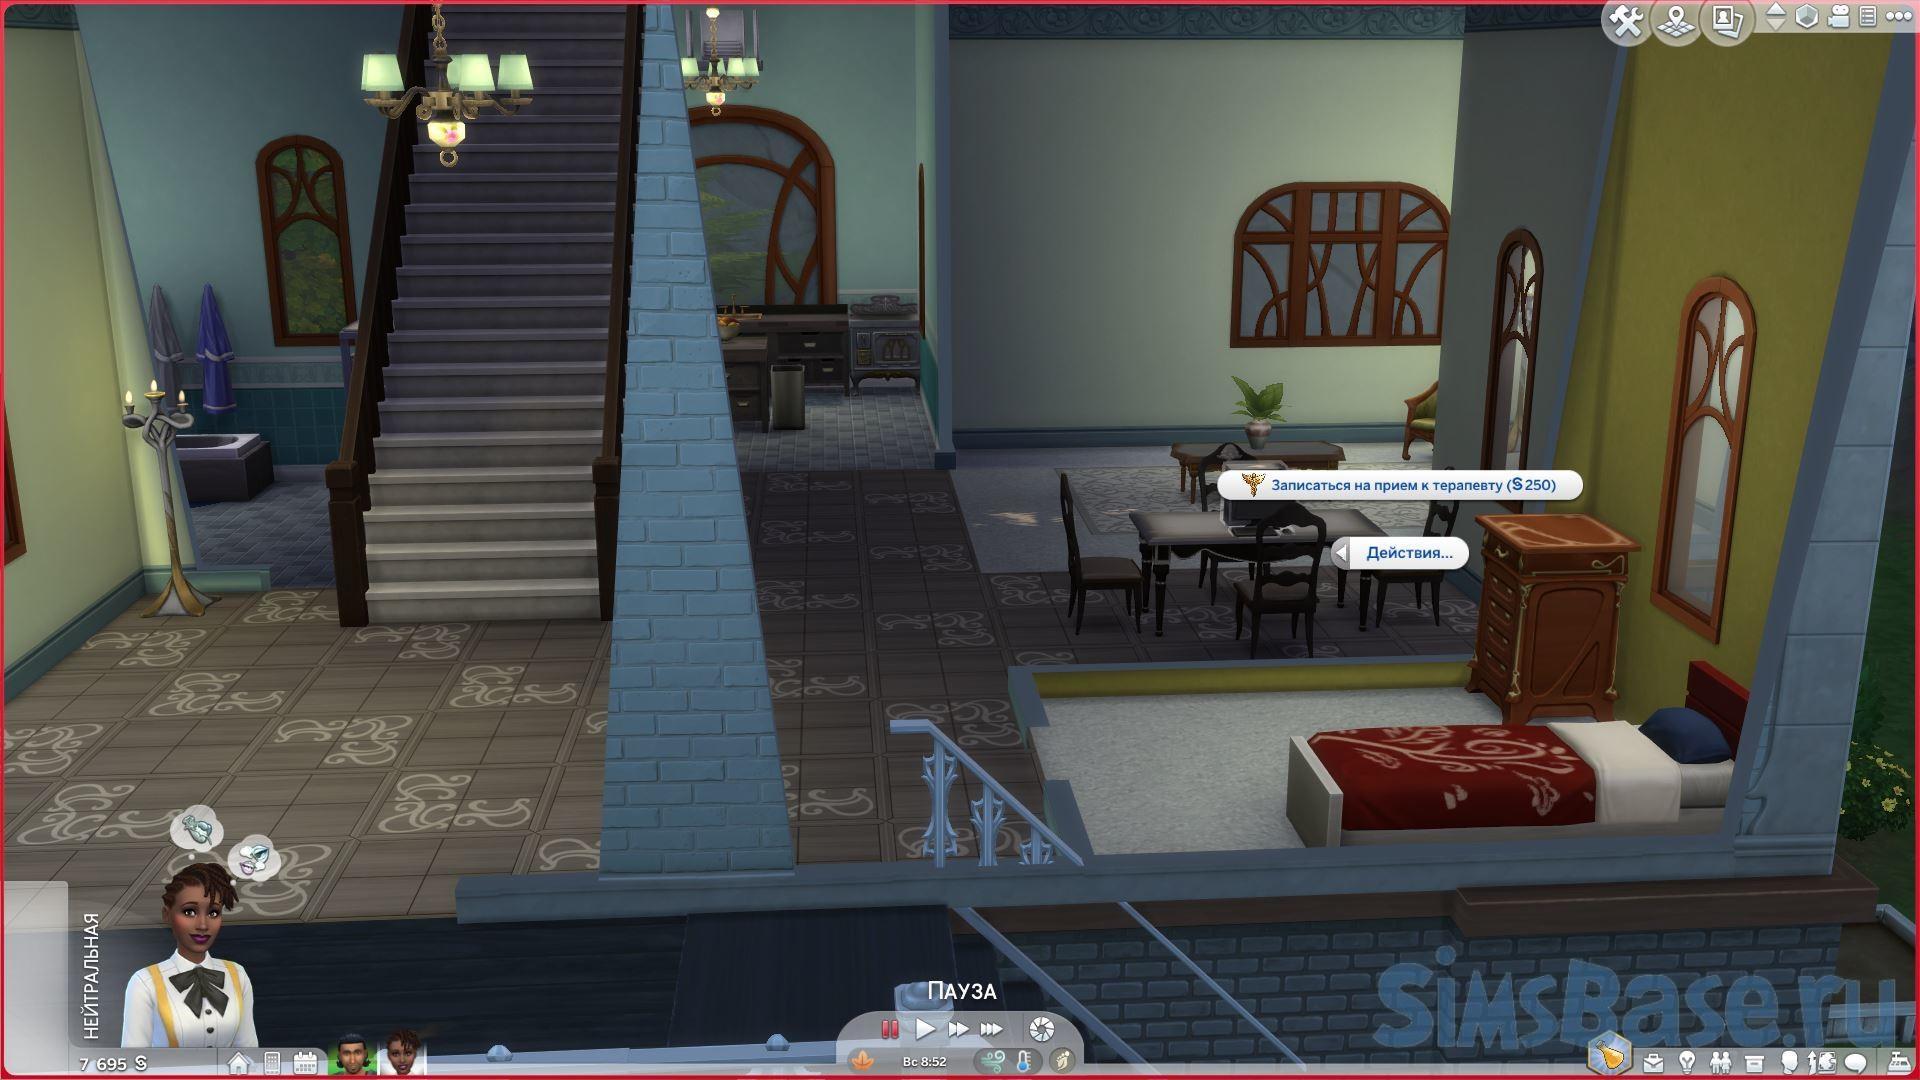 Мод «Столкновение с реальностью: болезни, лекарства, косметика и т.д.» от  Mirai для Sims 4